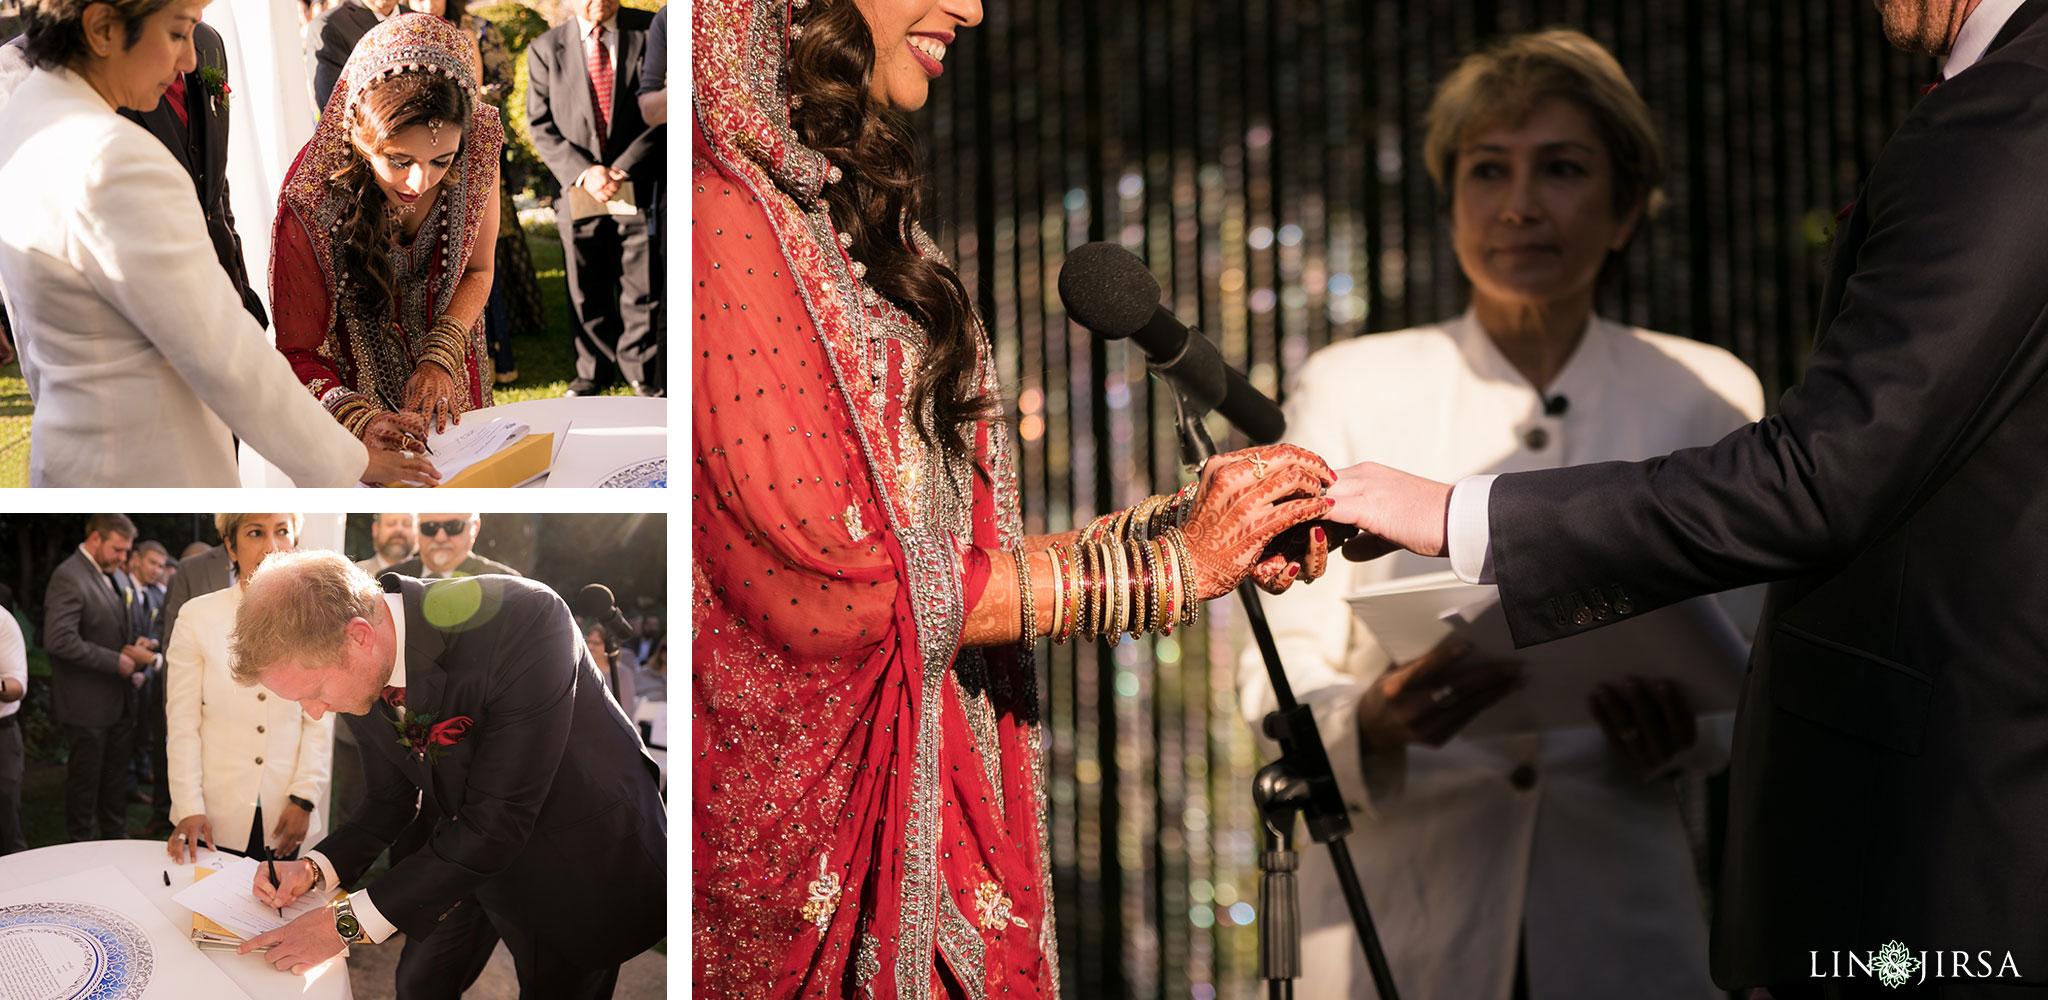 27 altadena town country club pakistani nikah wedding ceremony photography